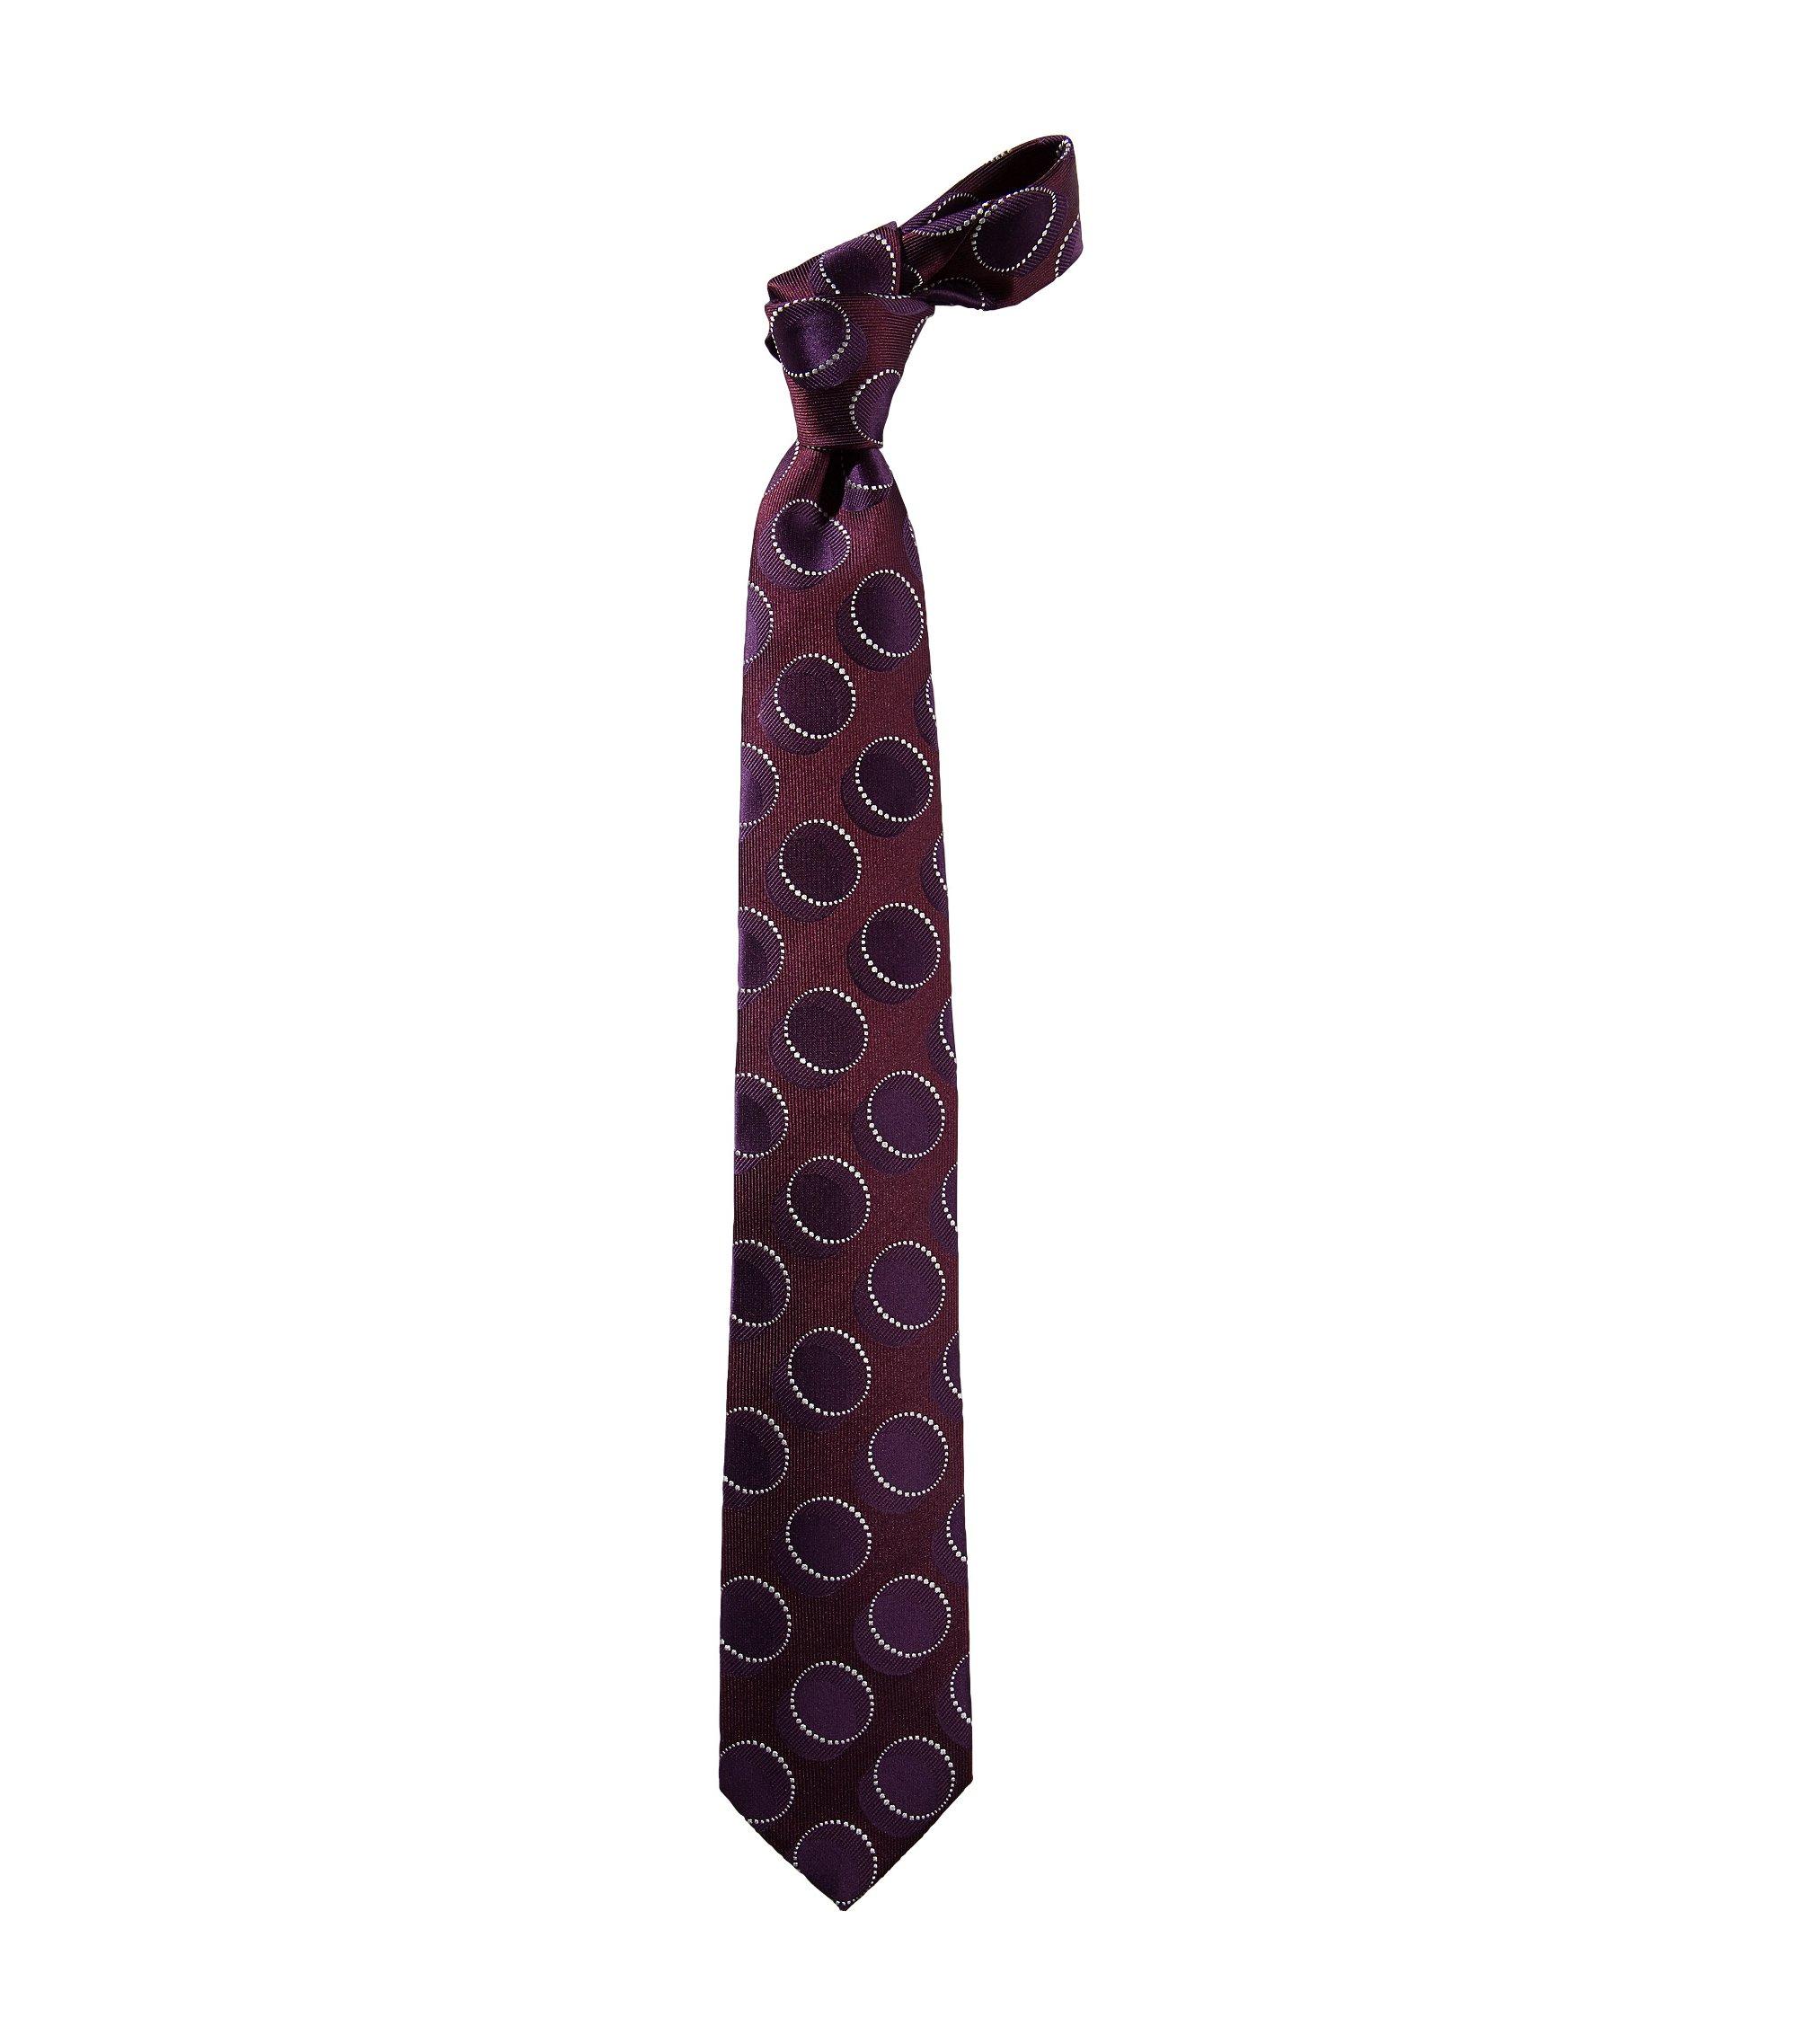 Krawatte ´Tie 7,5 cm` mit Retro-Dessin, Dunkel Lila